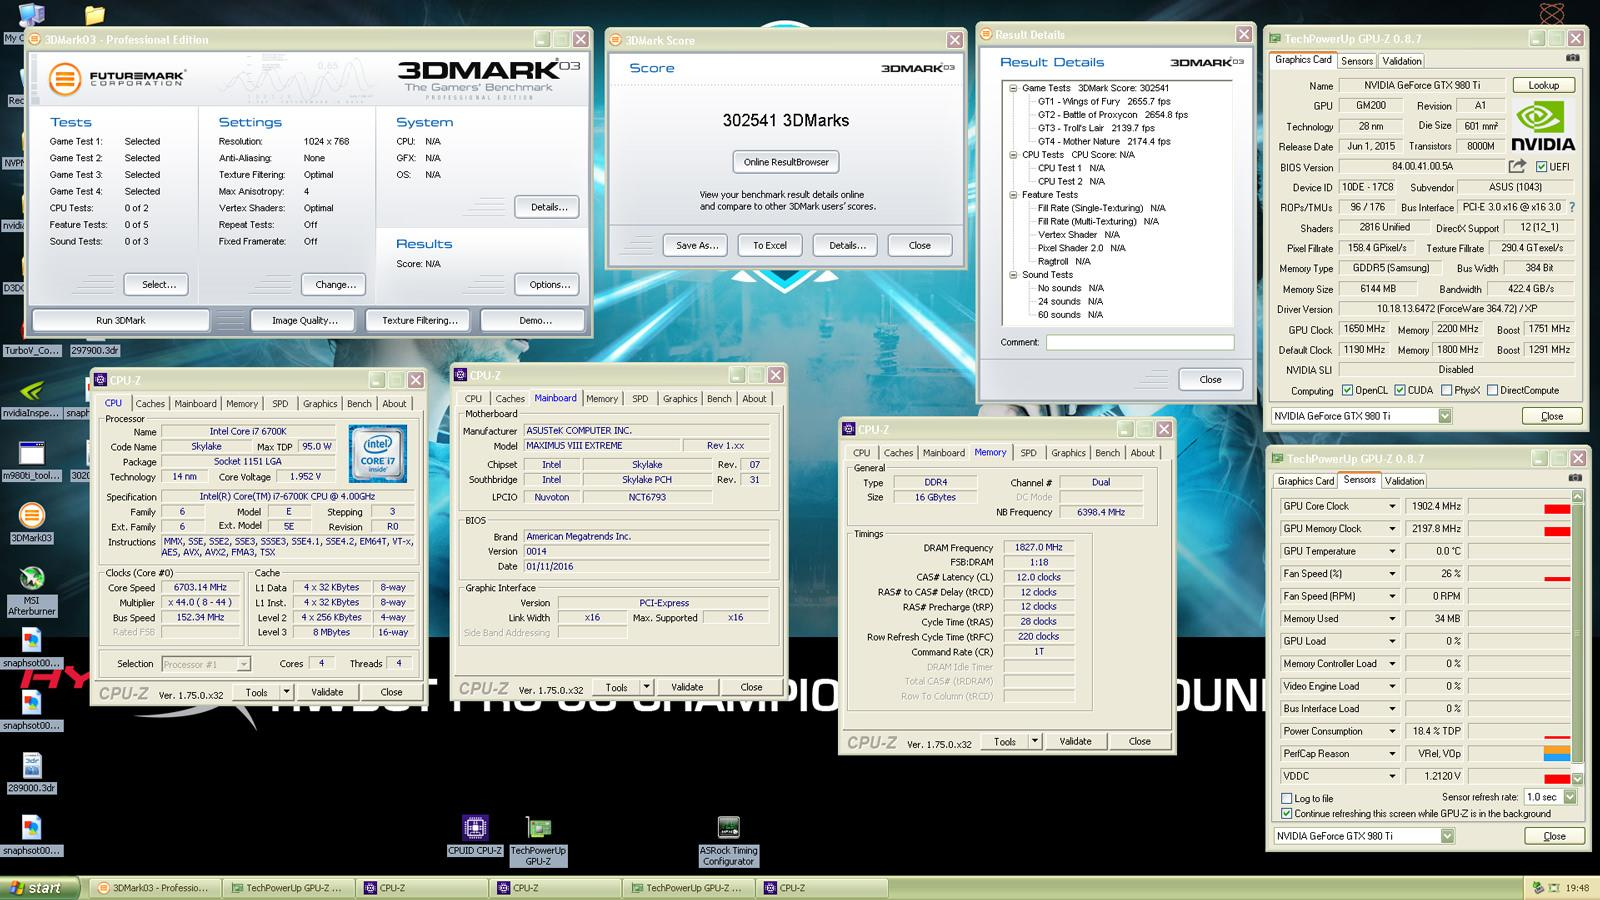 3dMark03 Record 03